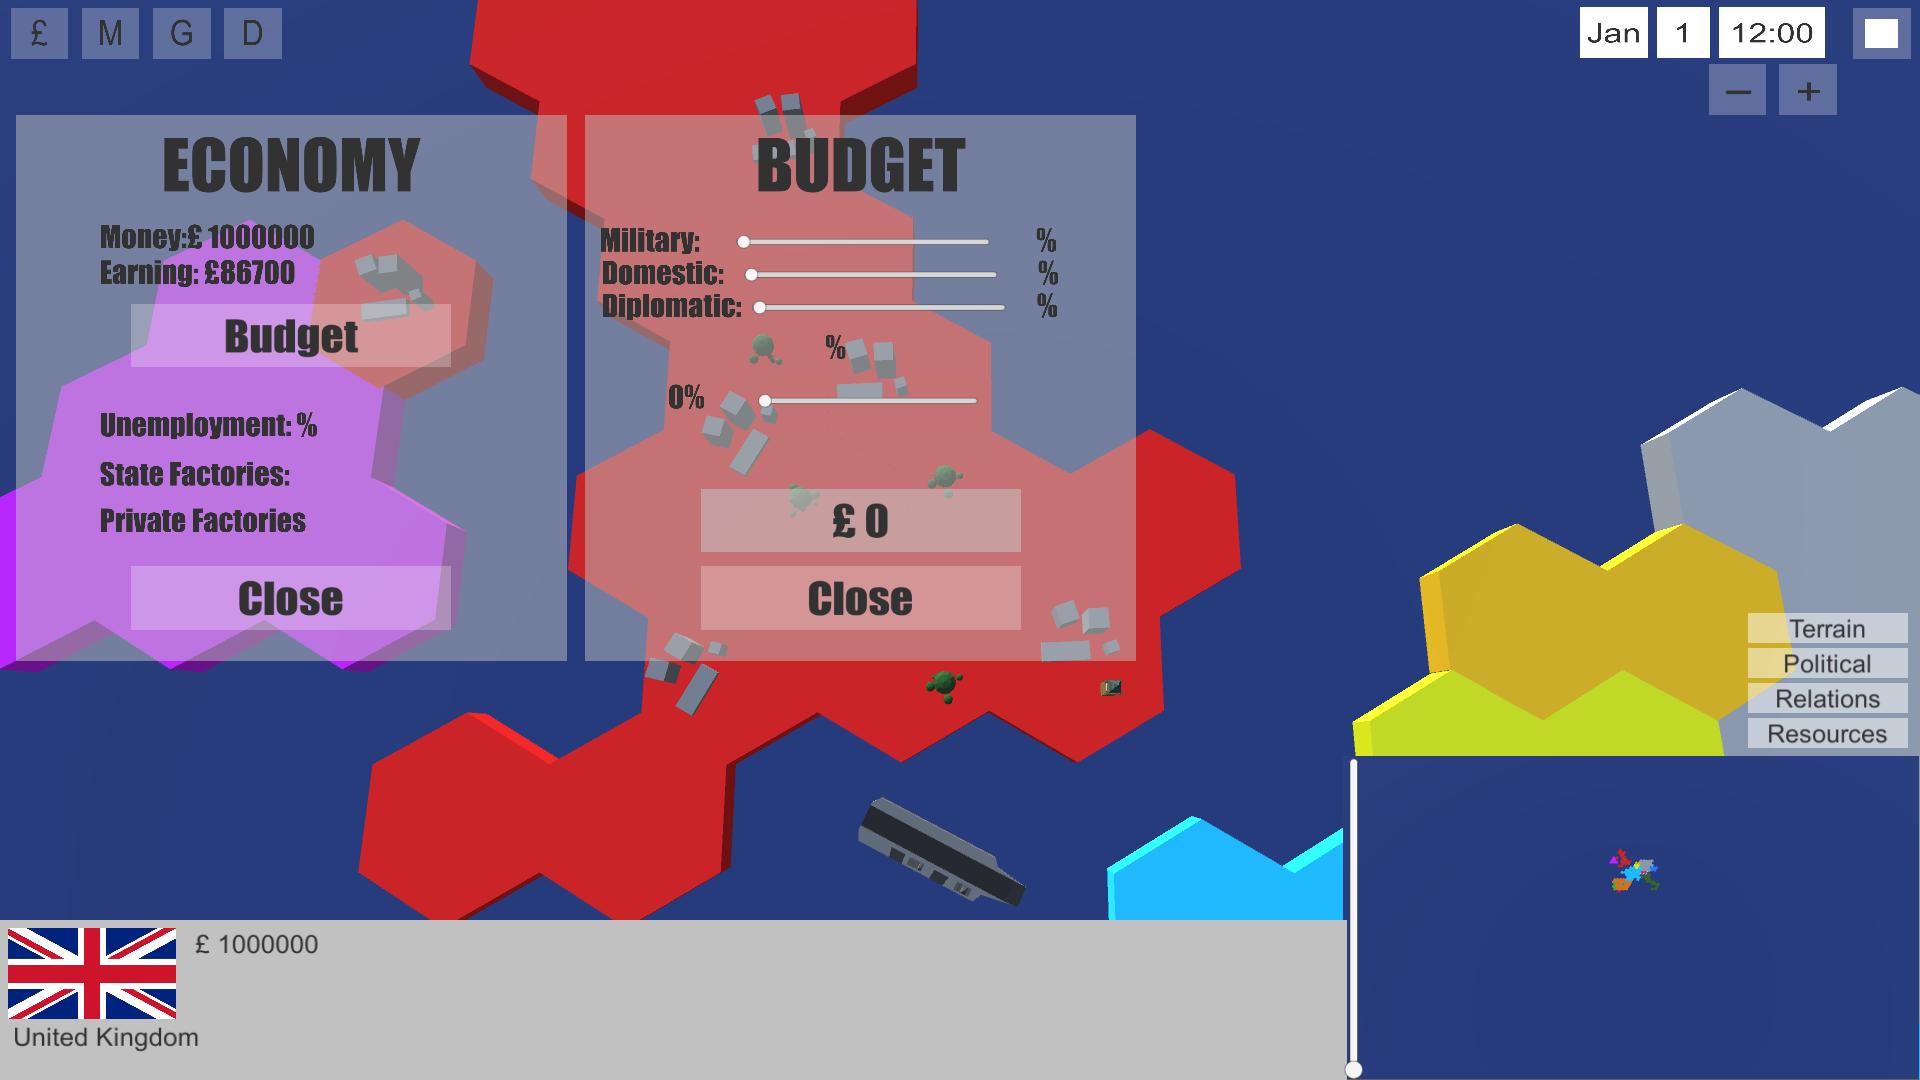 EconomyAndBudget